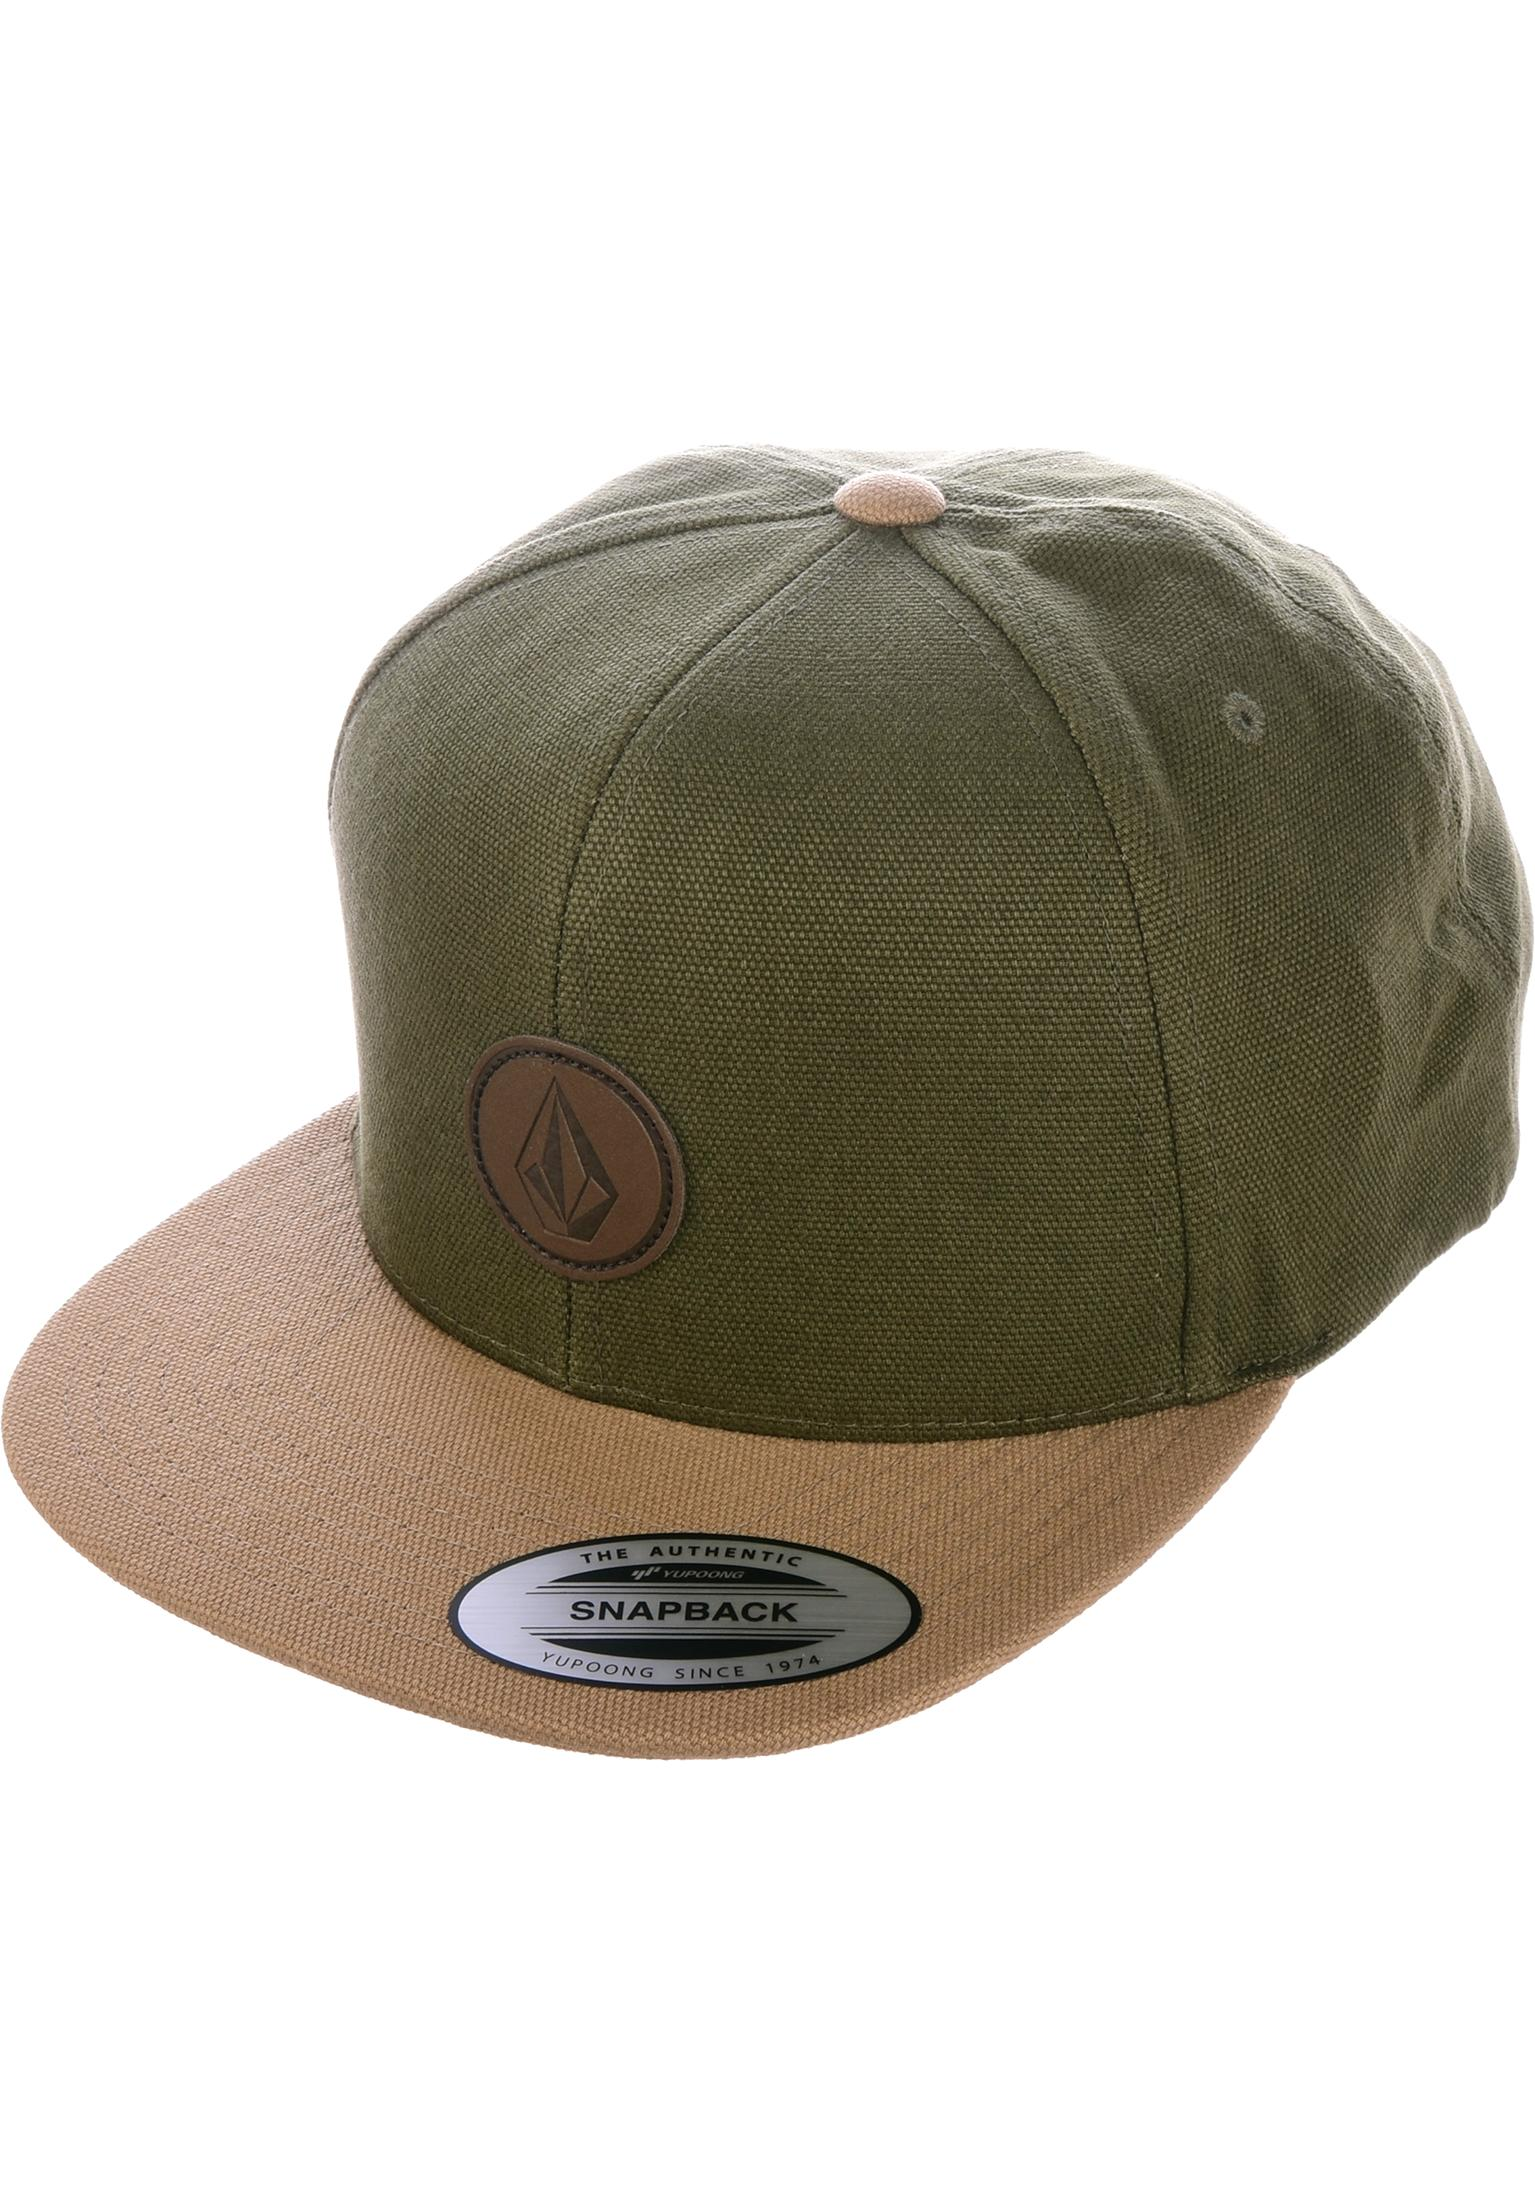 587cd8cb016 ... discount code for quarter fabric volcom caps in army for men titus  0041d c1760